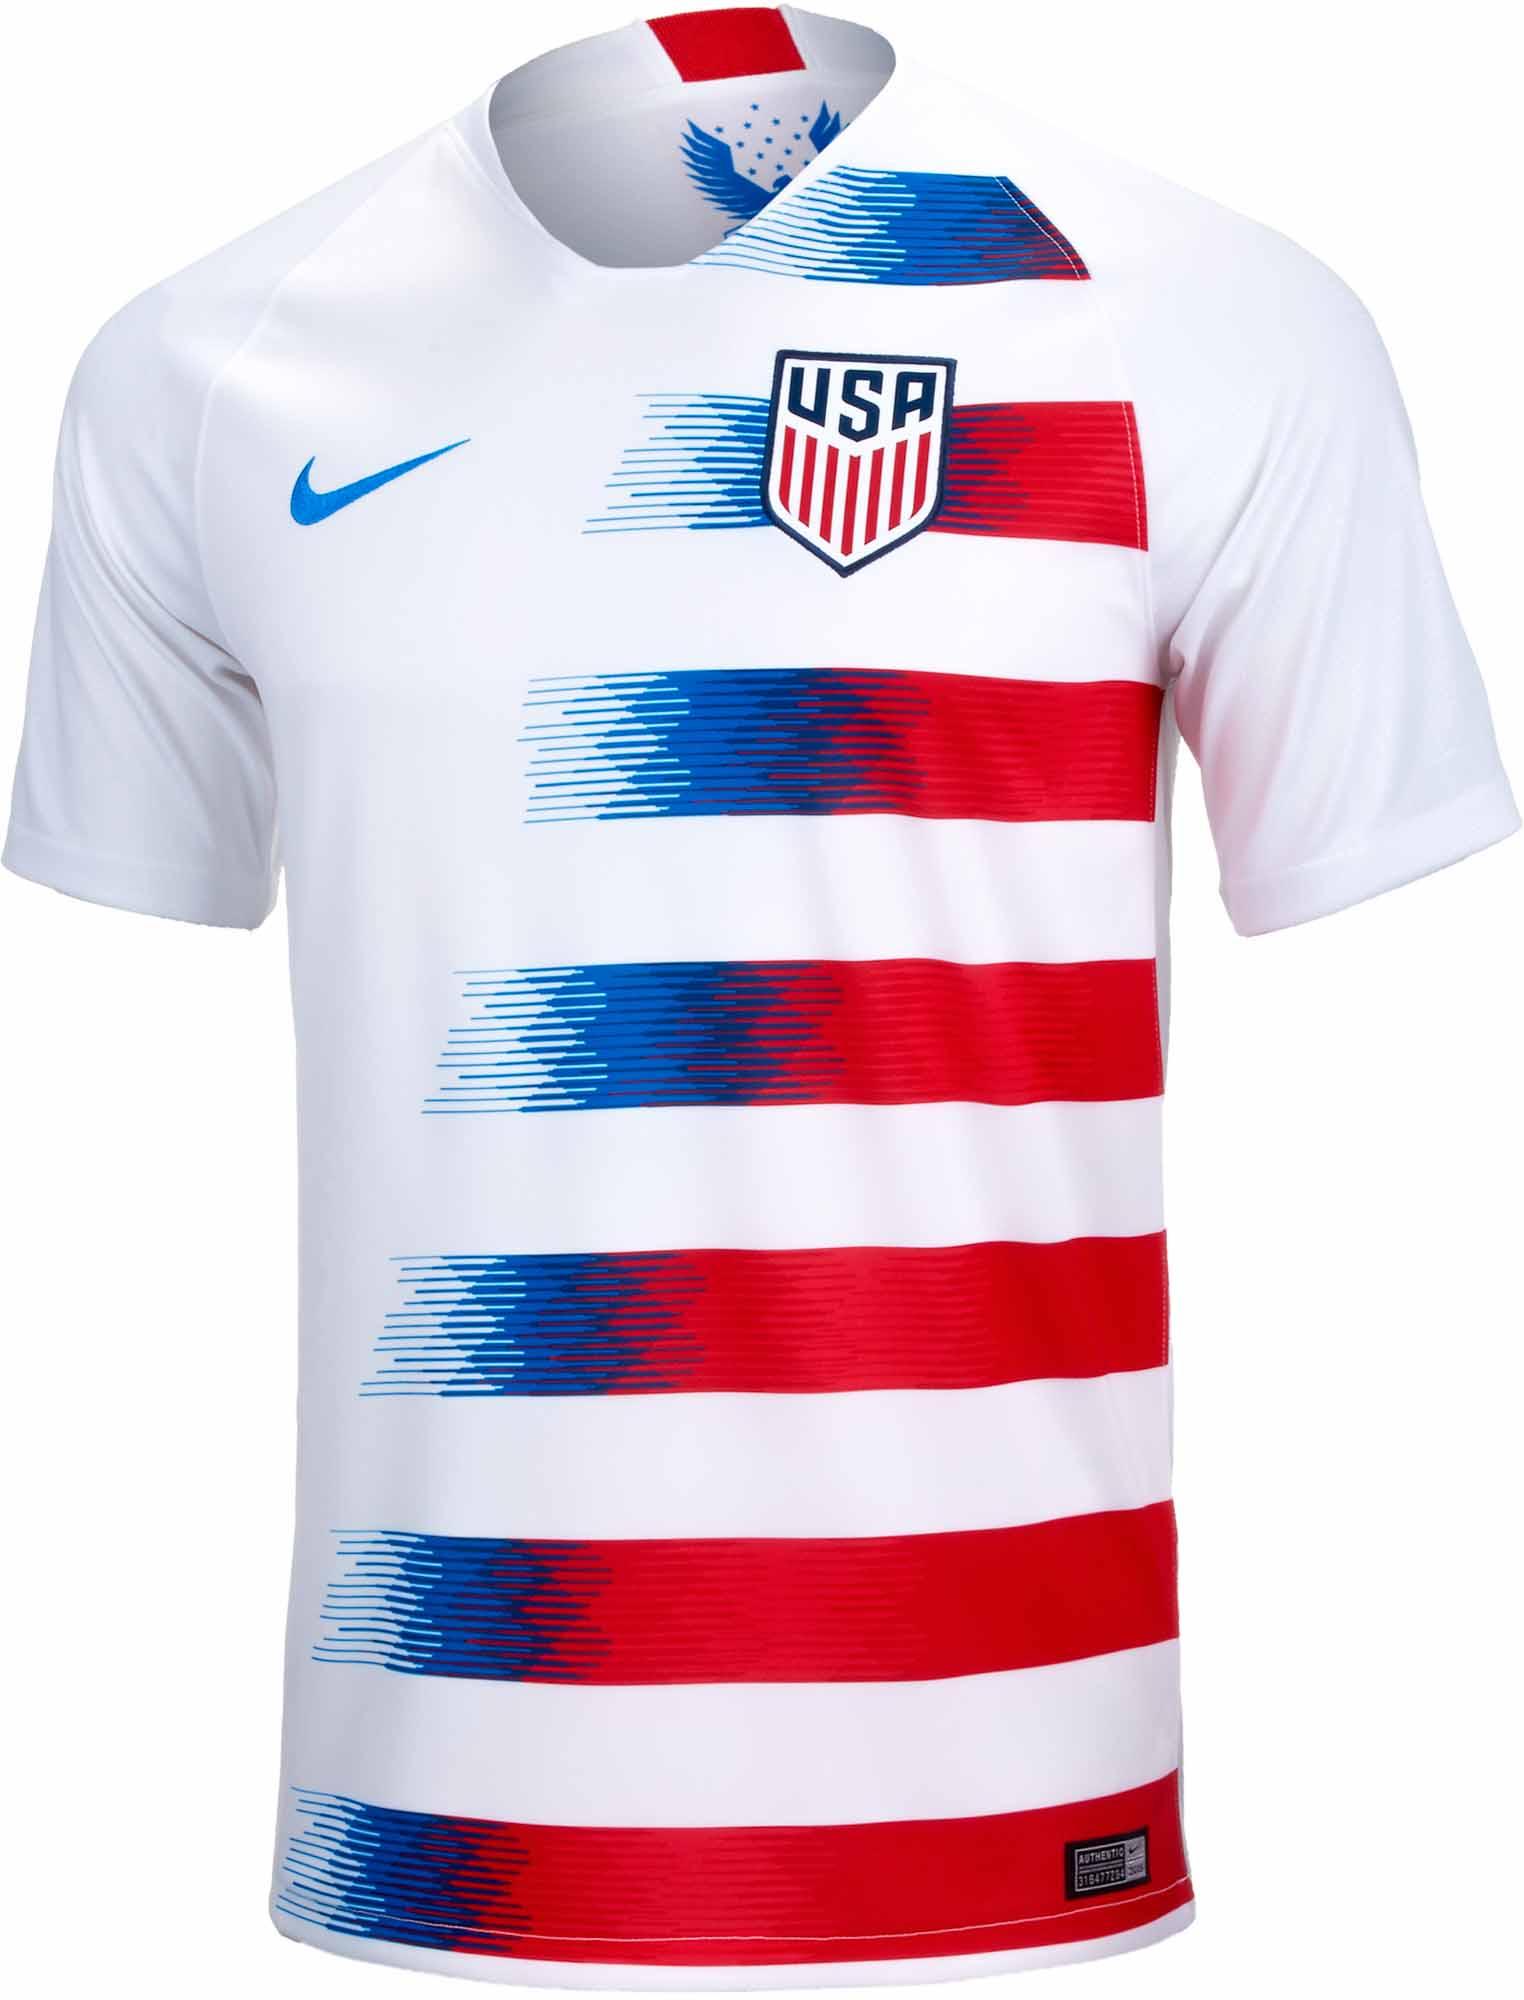 2018/19 Kids Nike Alex Morgan USA Home Jersey - SoccerPro